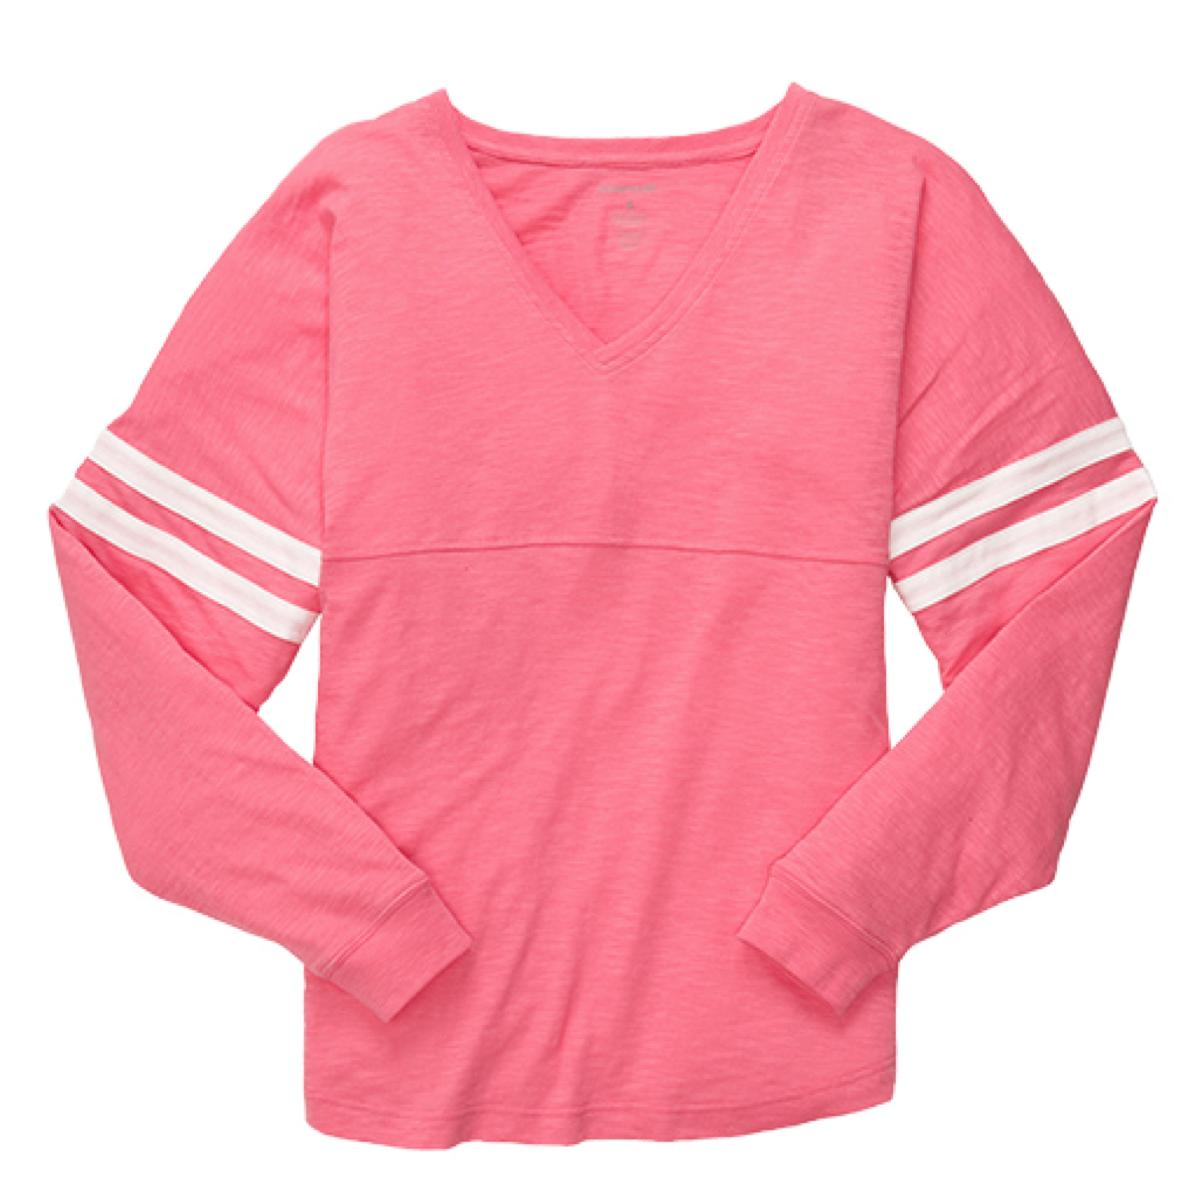 Tennis Anyone Spirit Jersey Shirt